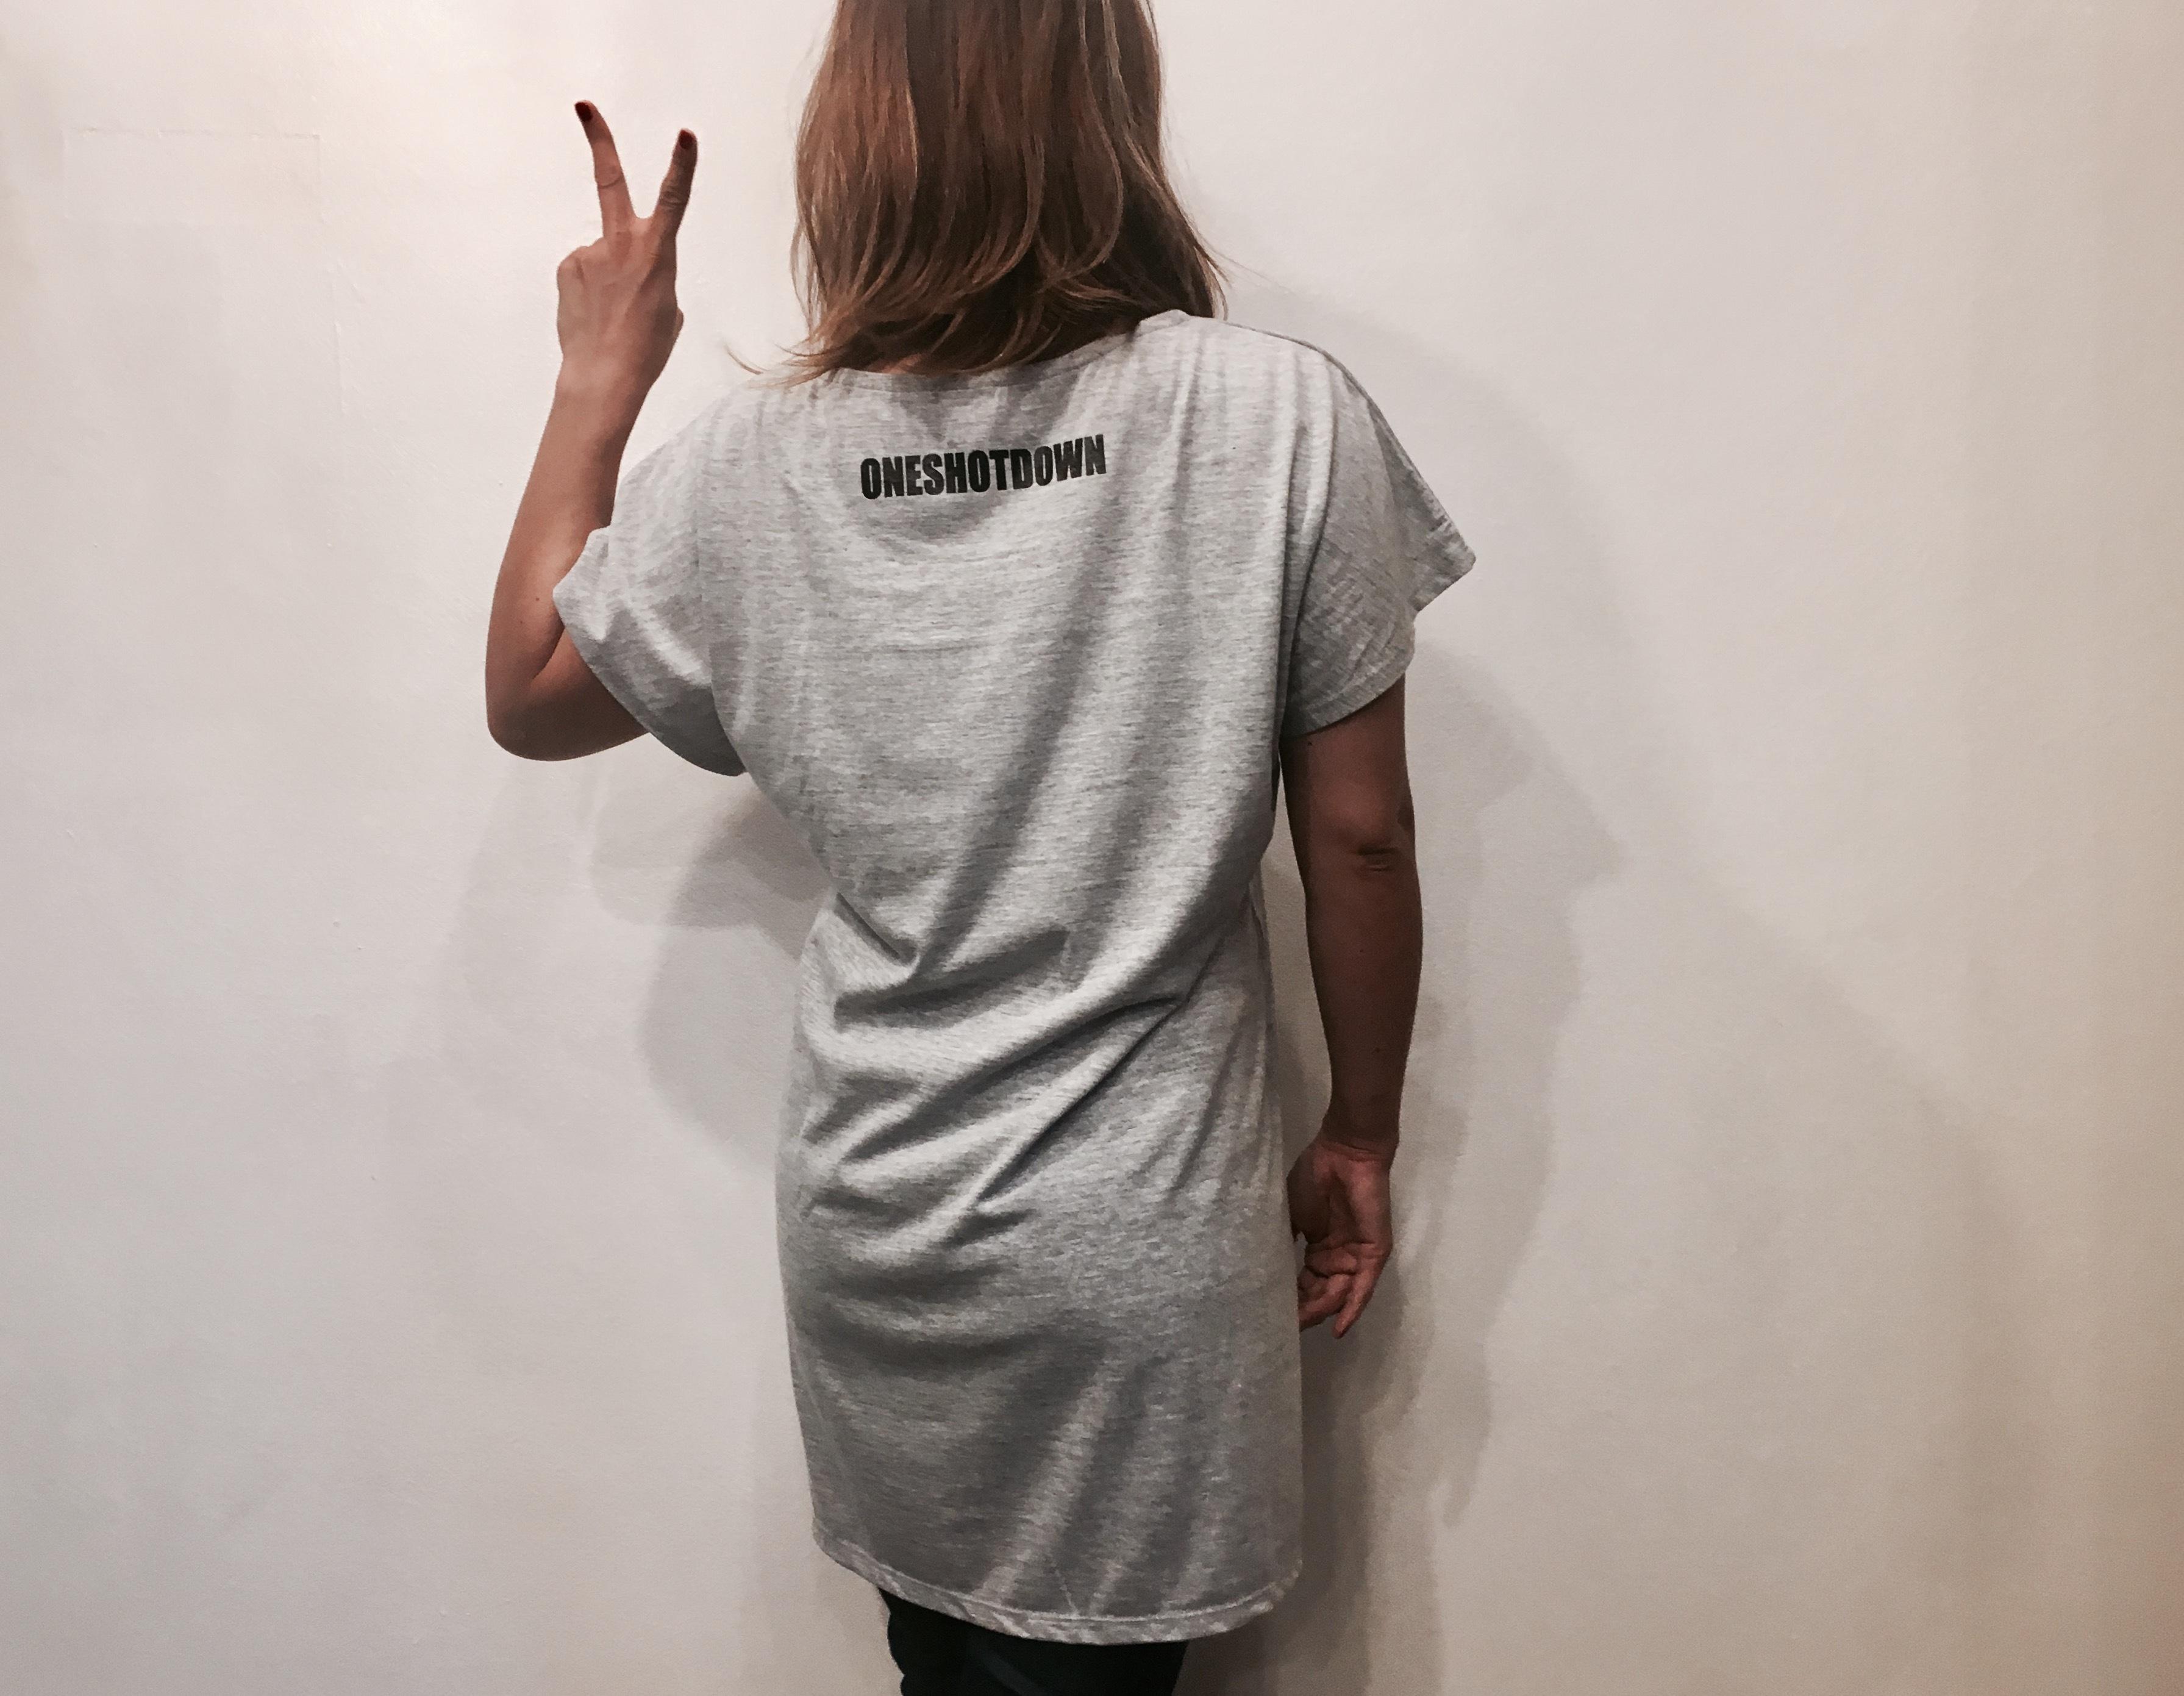 ONESHOTDOWN ガールズ ワンピースTシャツ - 画像3